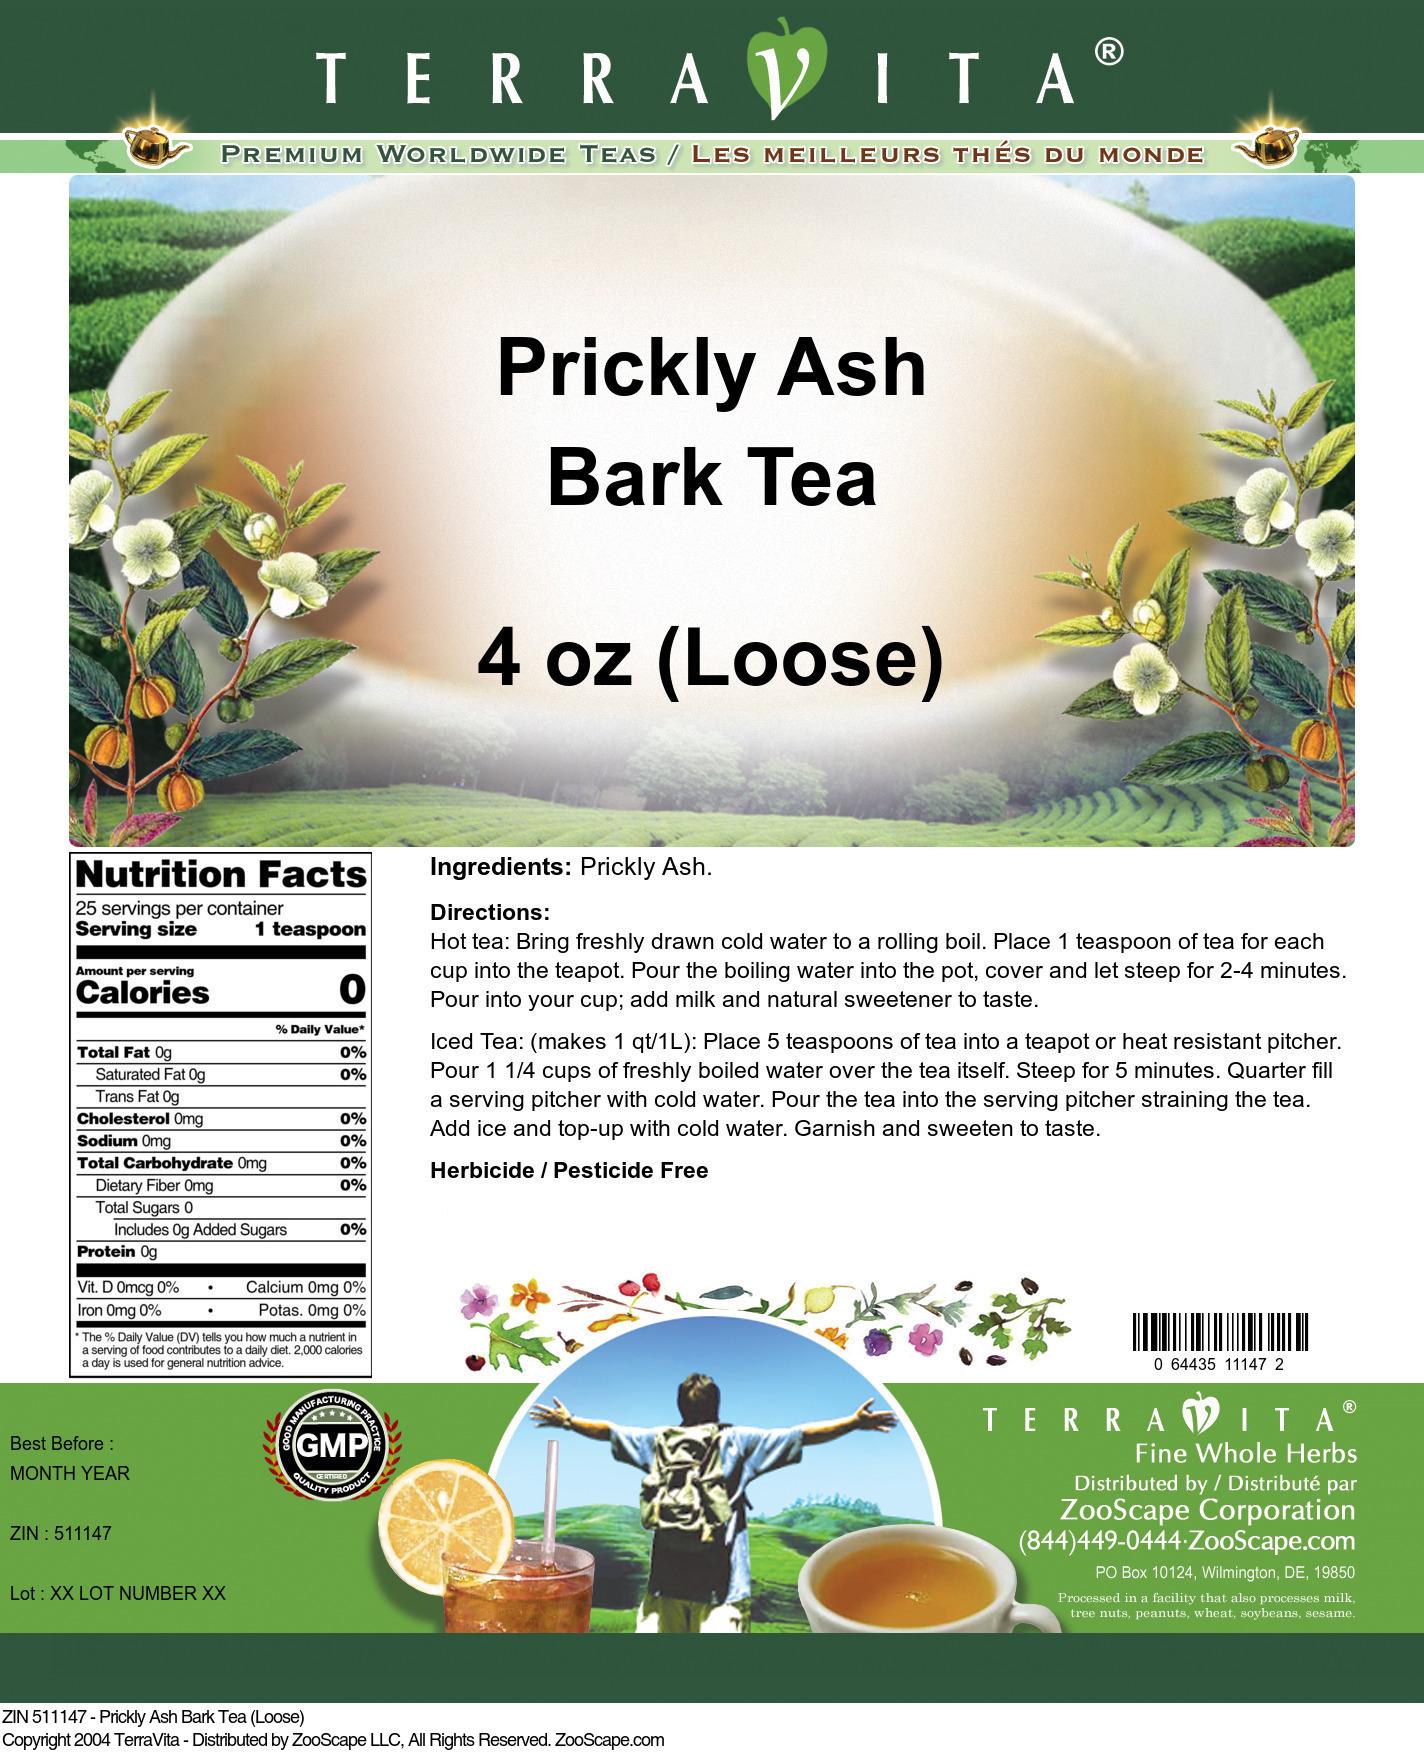 Prickly Ash Bark Tea (Loose)